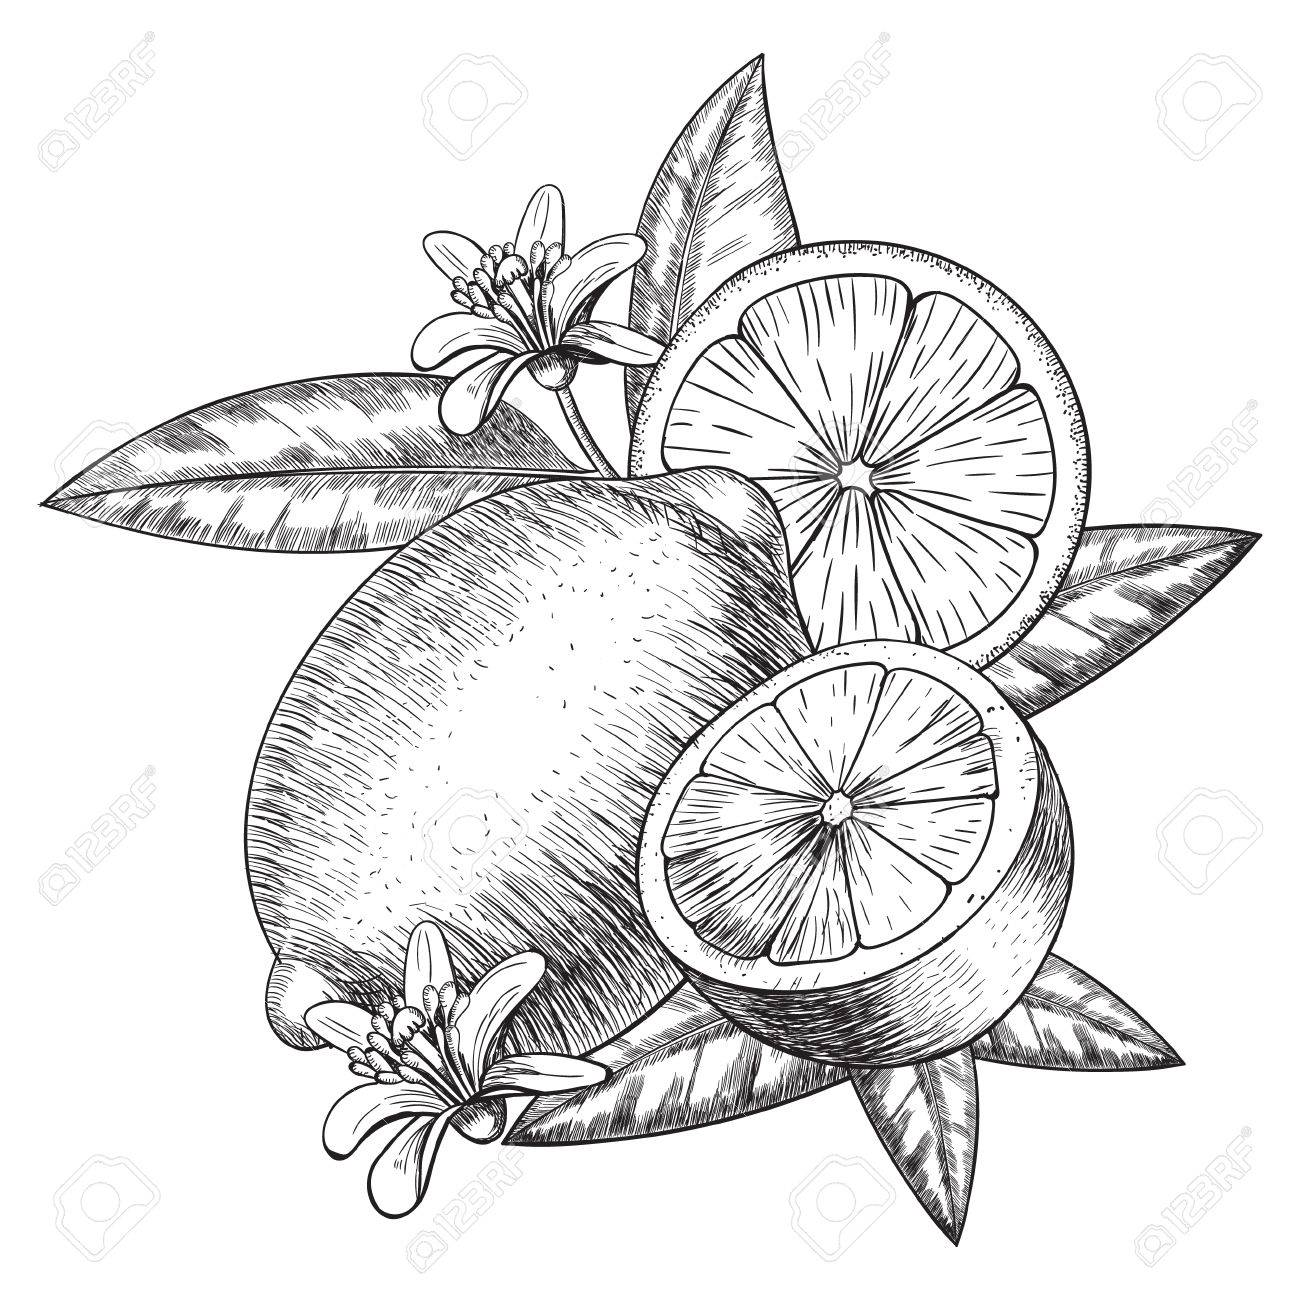 1300x1300 Lime Or Lemon Set. Whole Lemon, Sliced Pieces Half, Leave Sketch